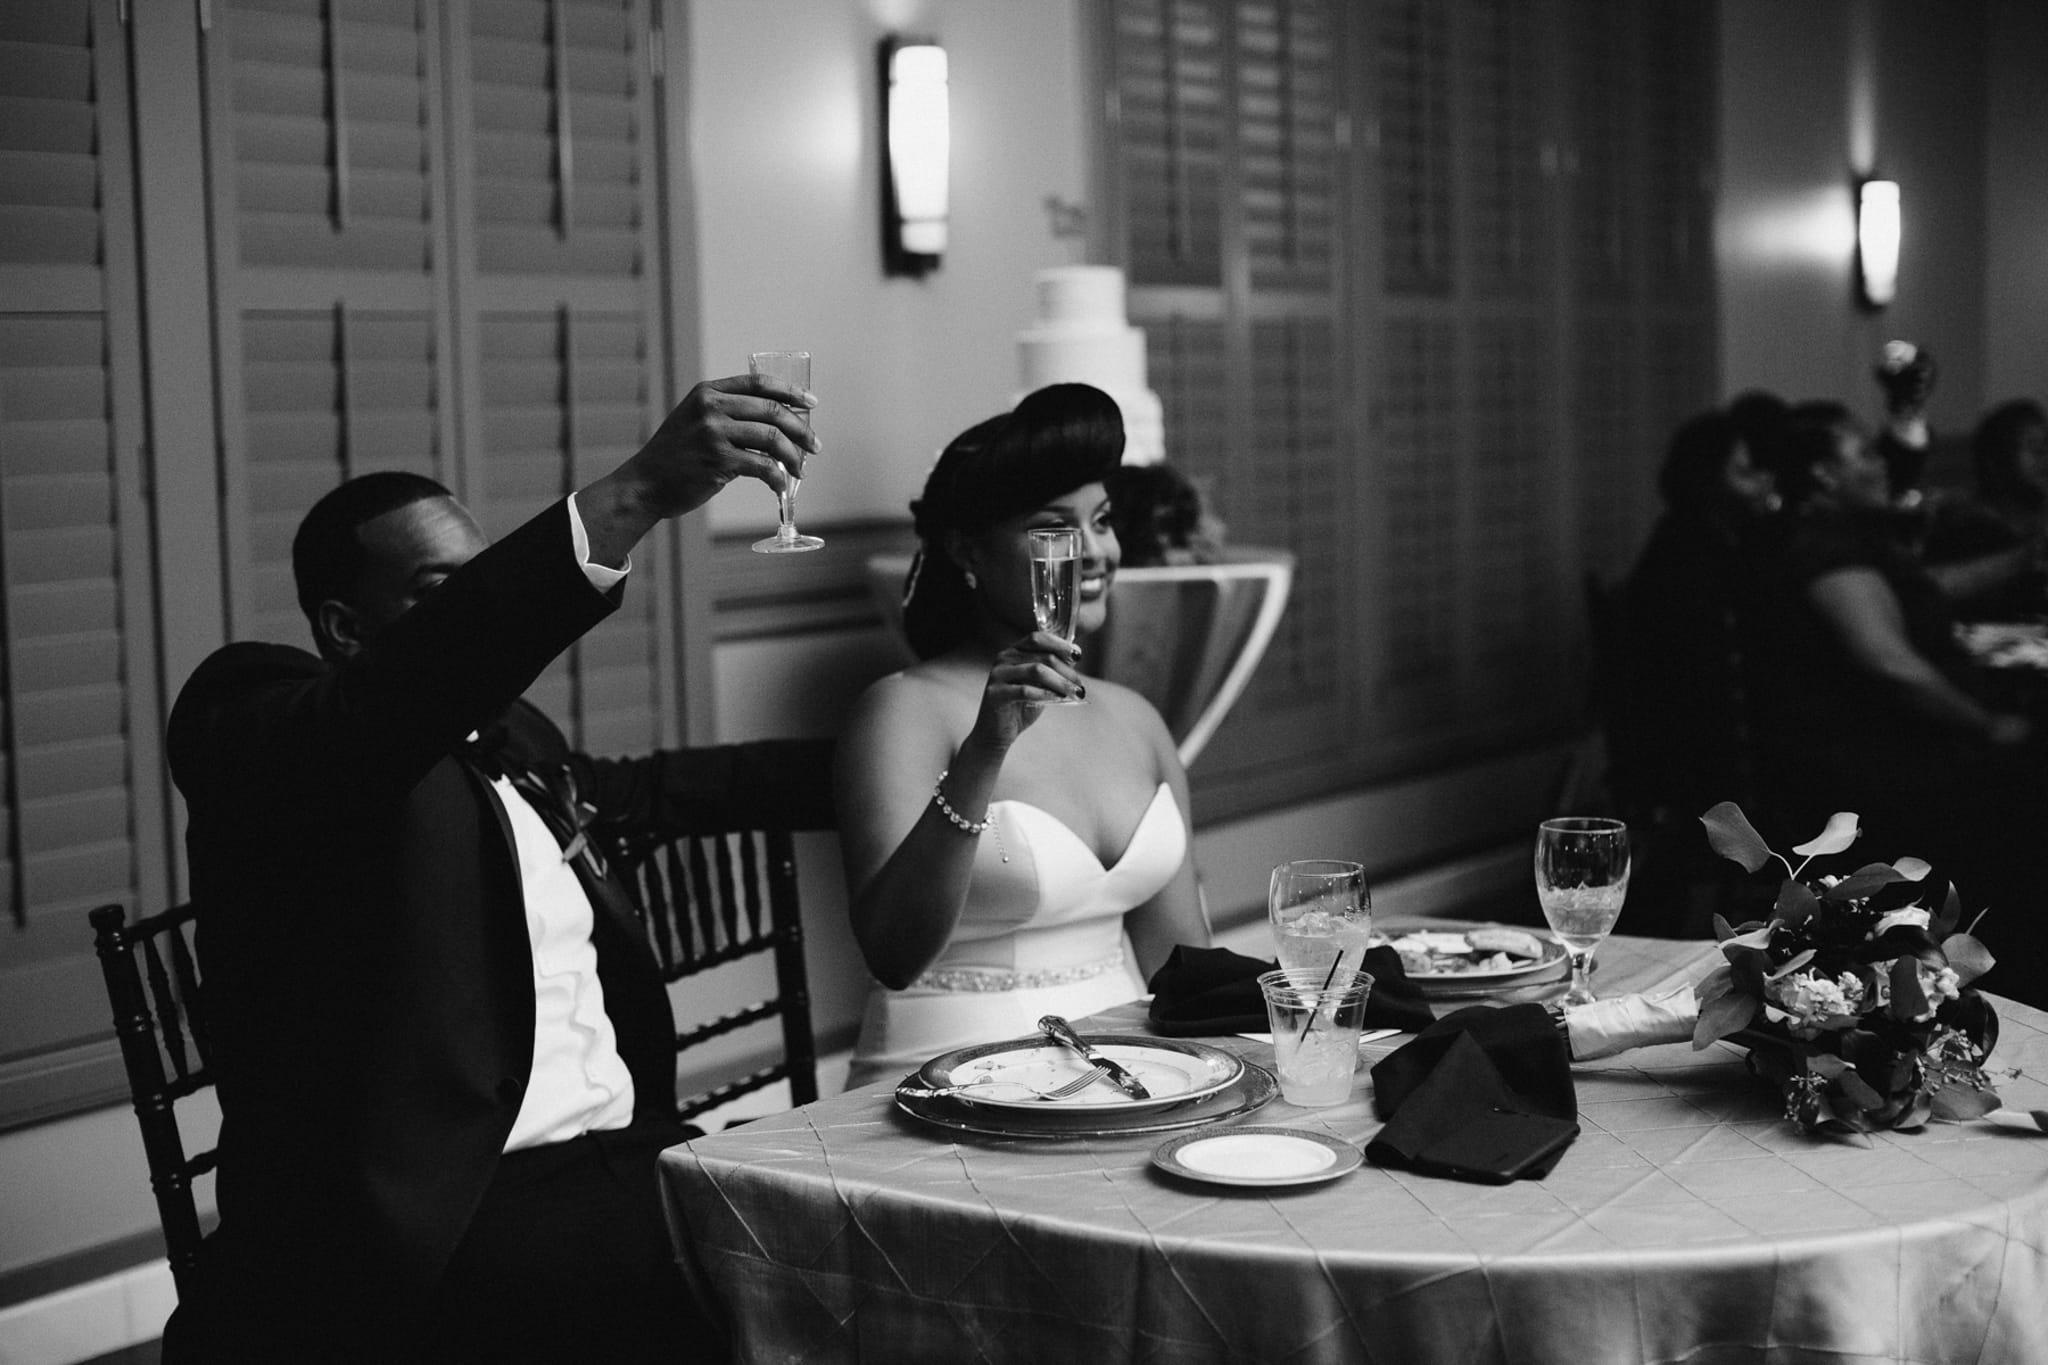 noahs-event-venue-wedding-charlotte-nc.jpg